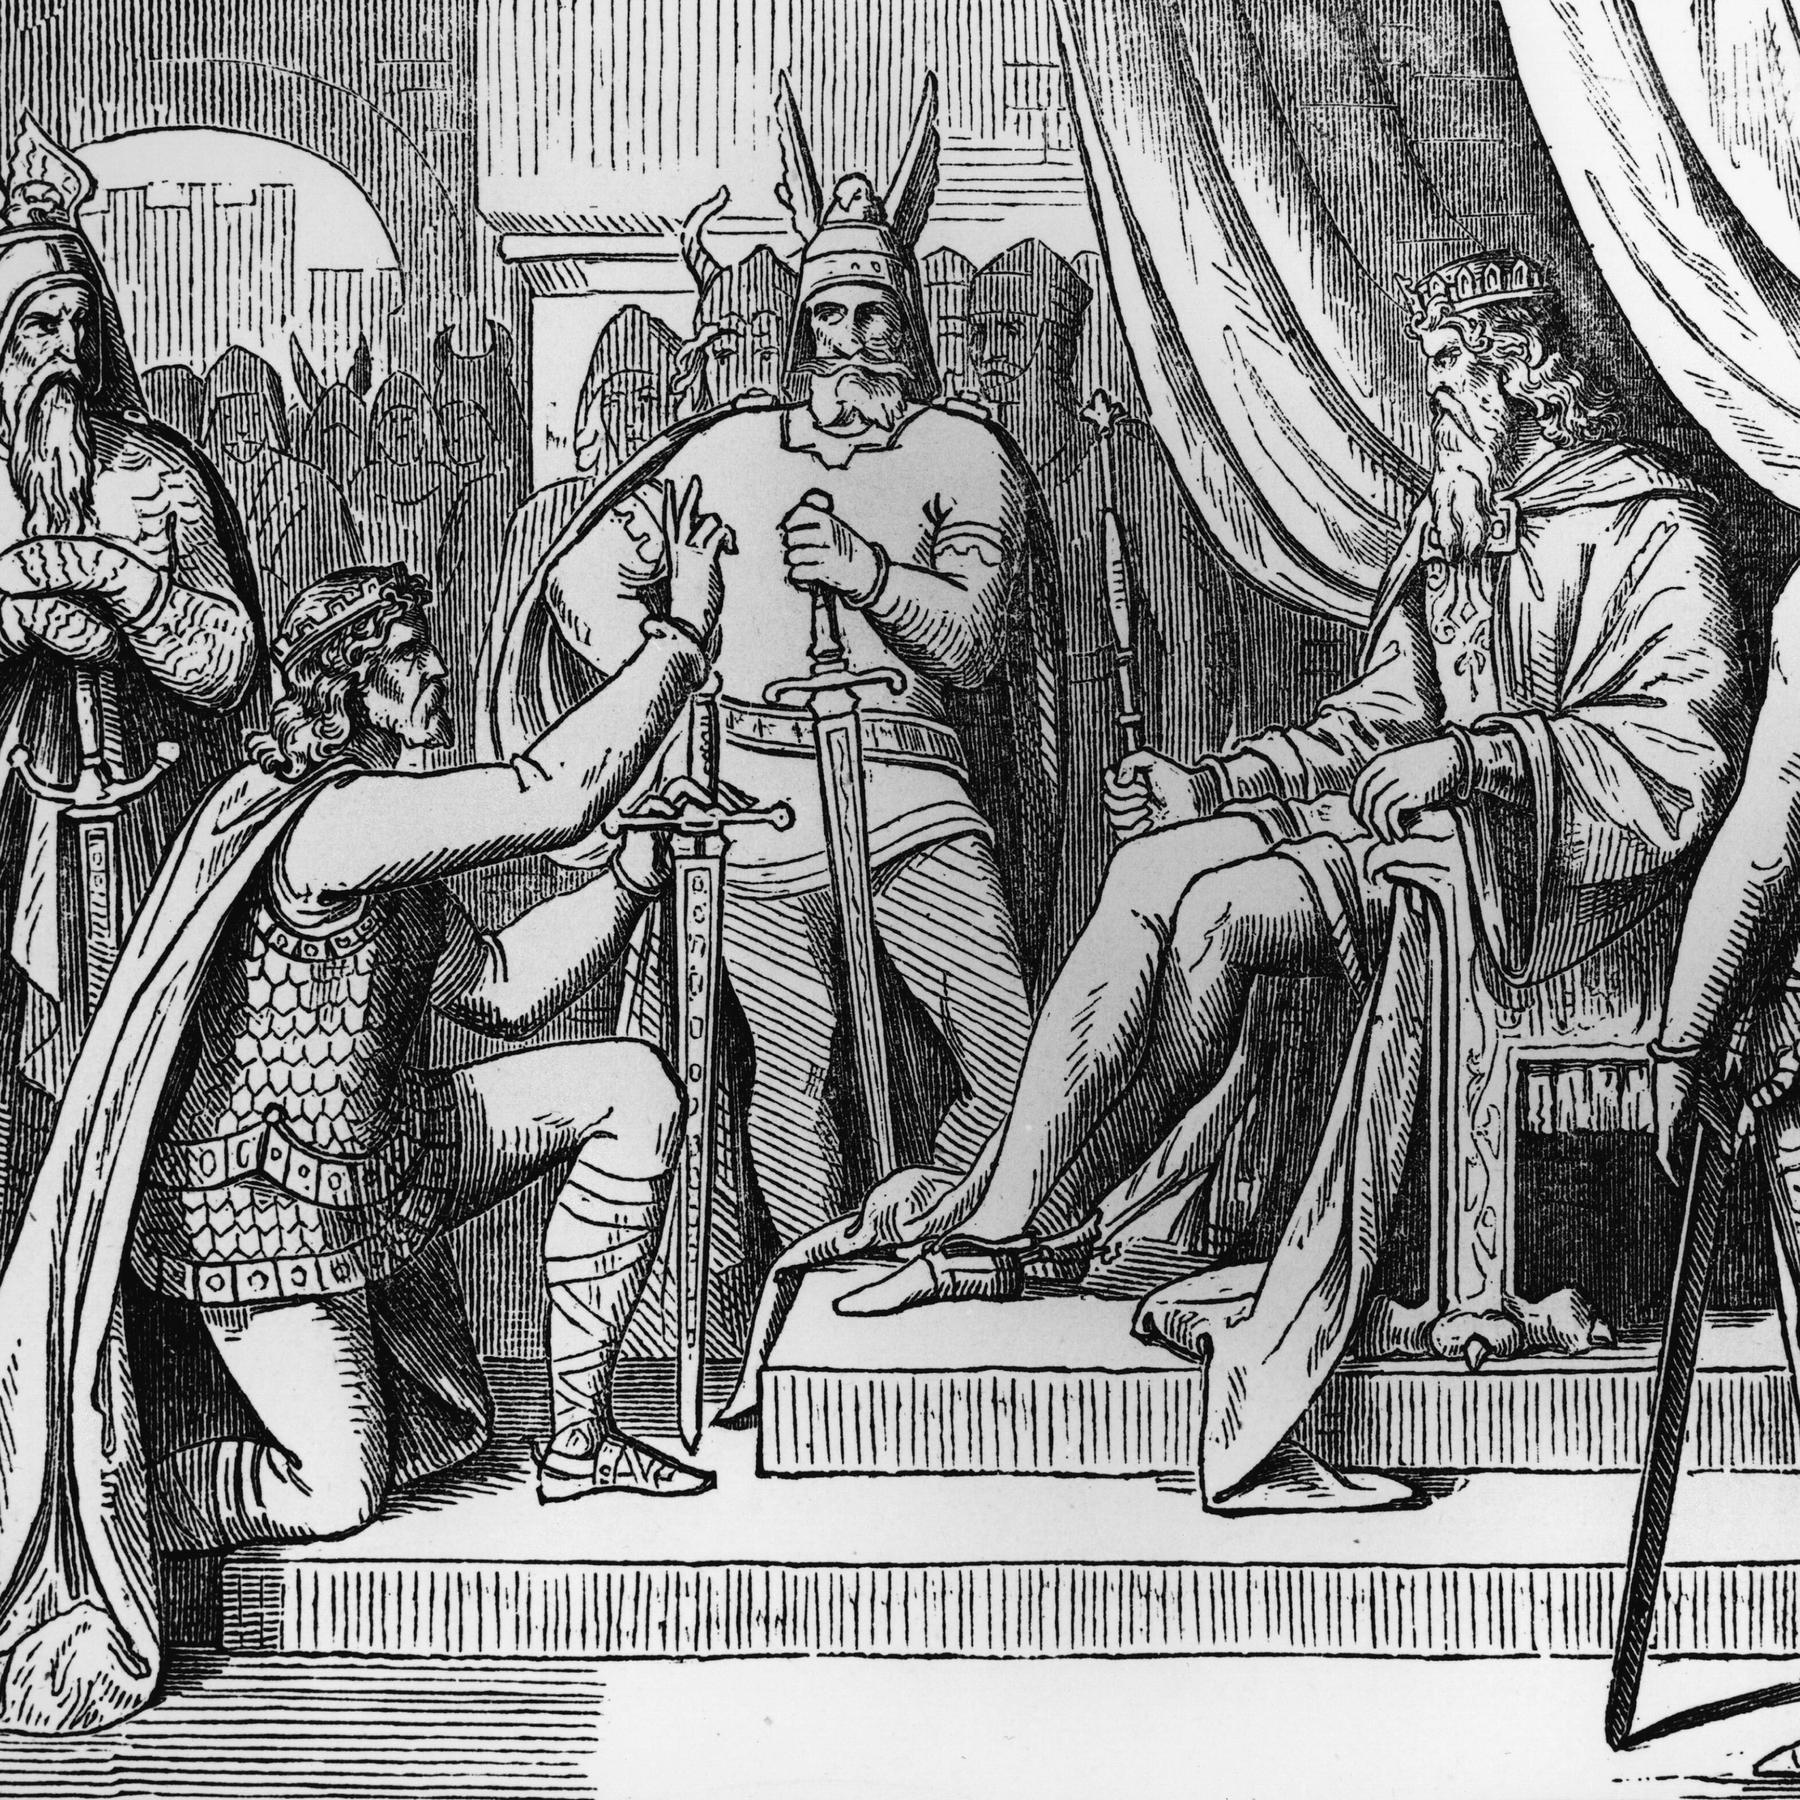 Tassilo III. - Das Ende der Agilolfinger